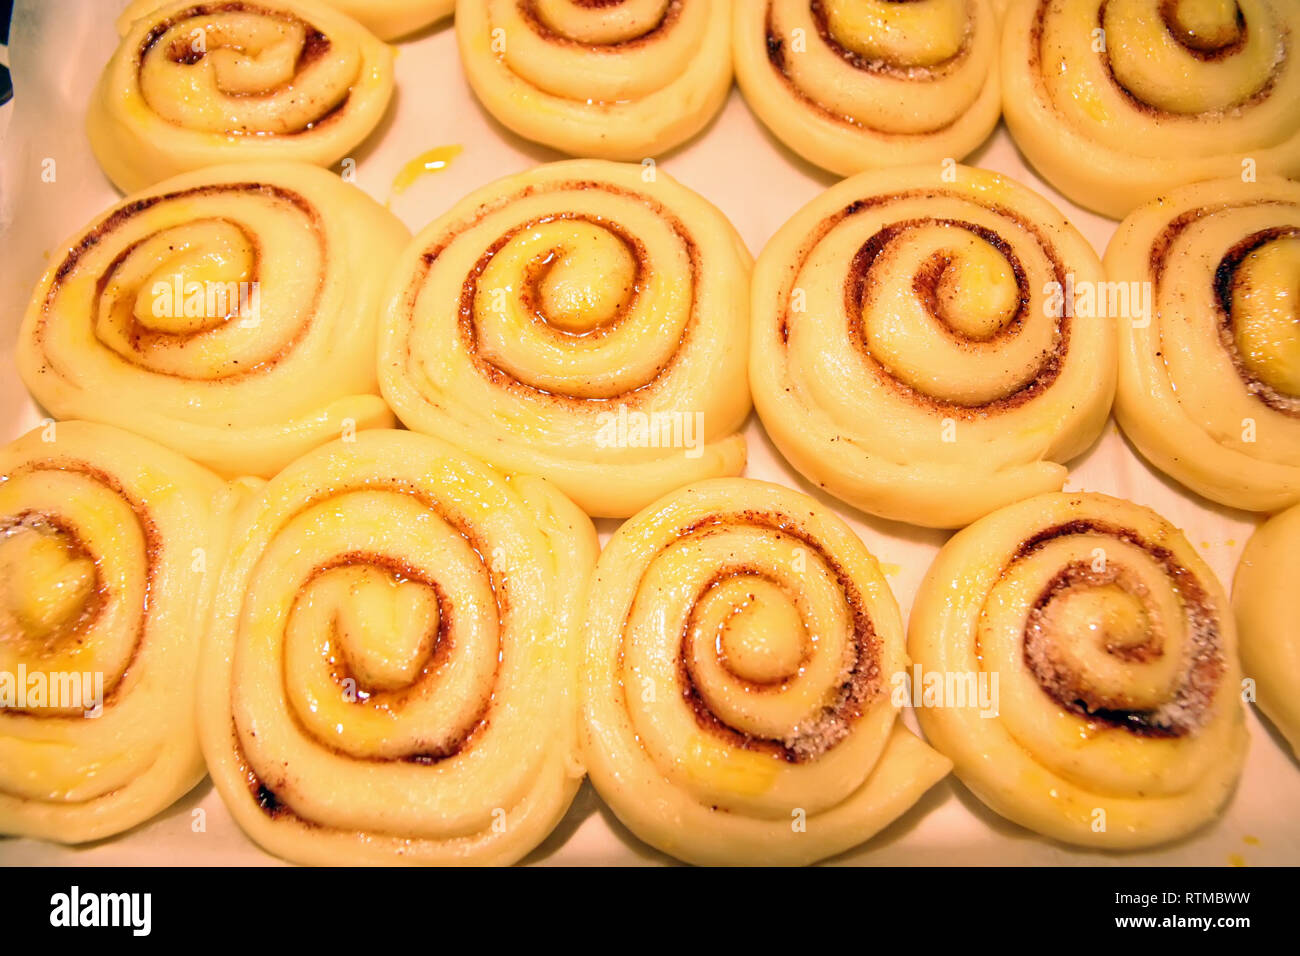 Home made cookies. Preparing homemade cookies. Fresh made breakfast. Baking home cookies. - Stock Image